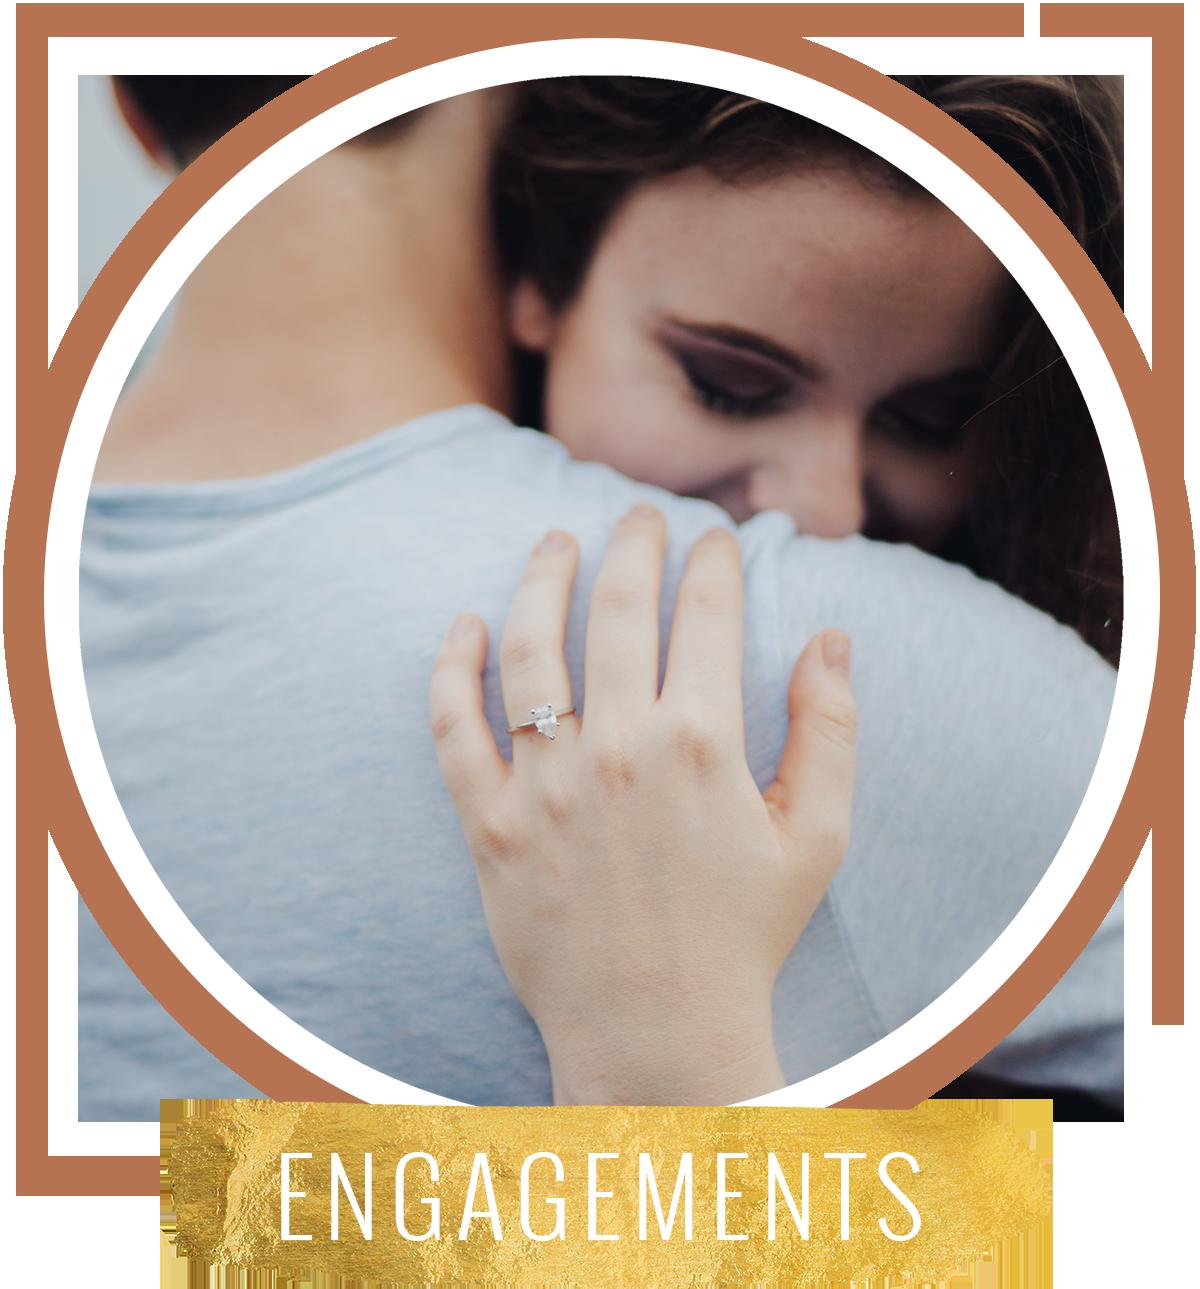 engagementbutton.png